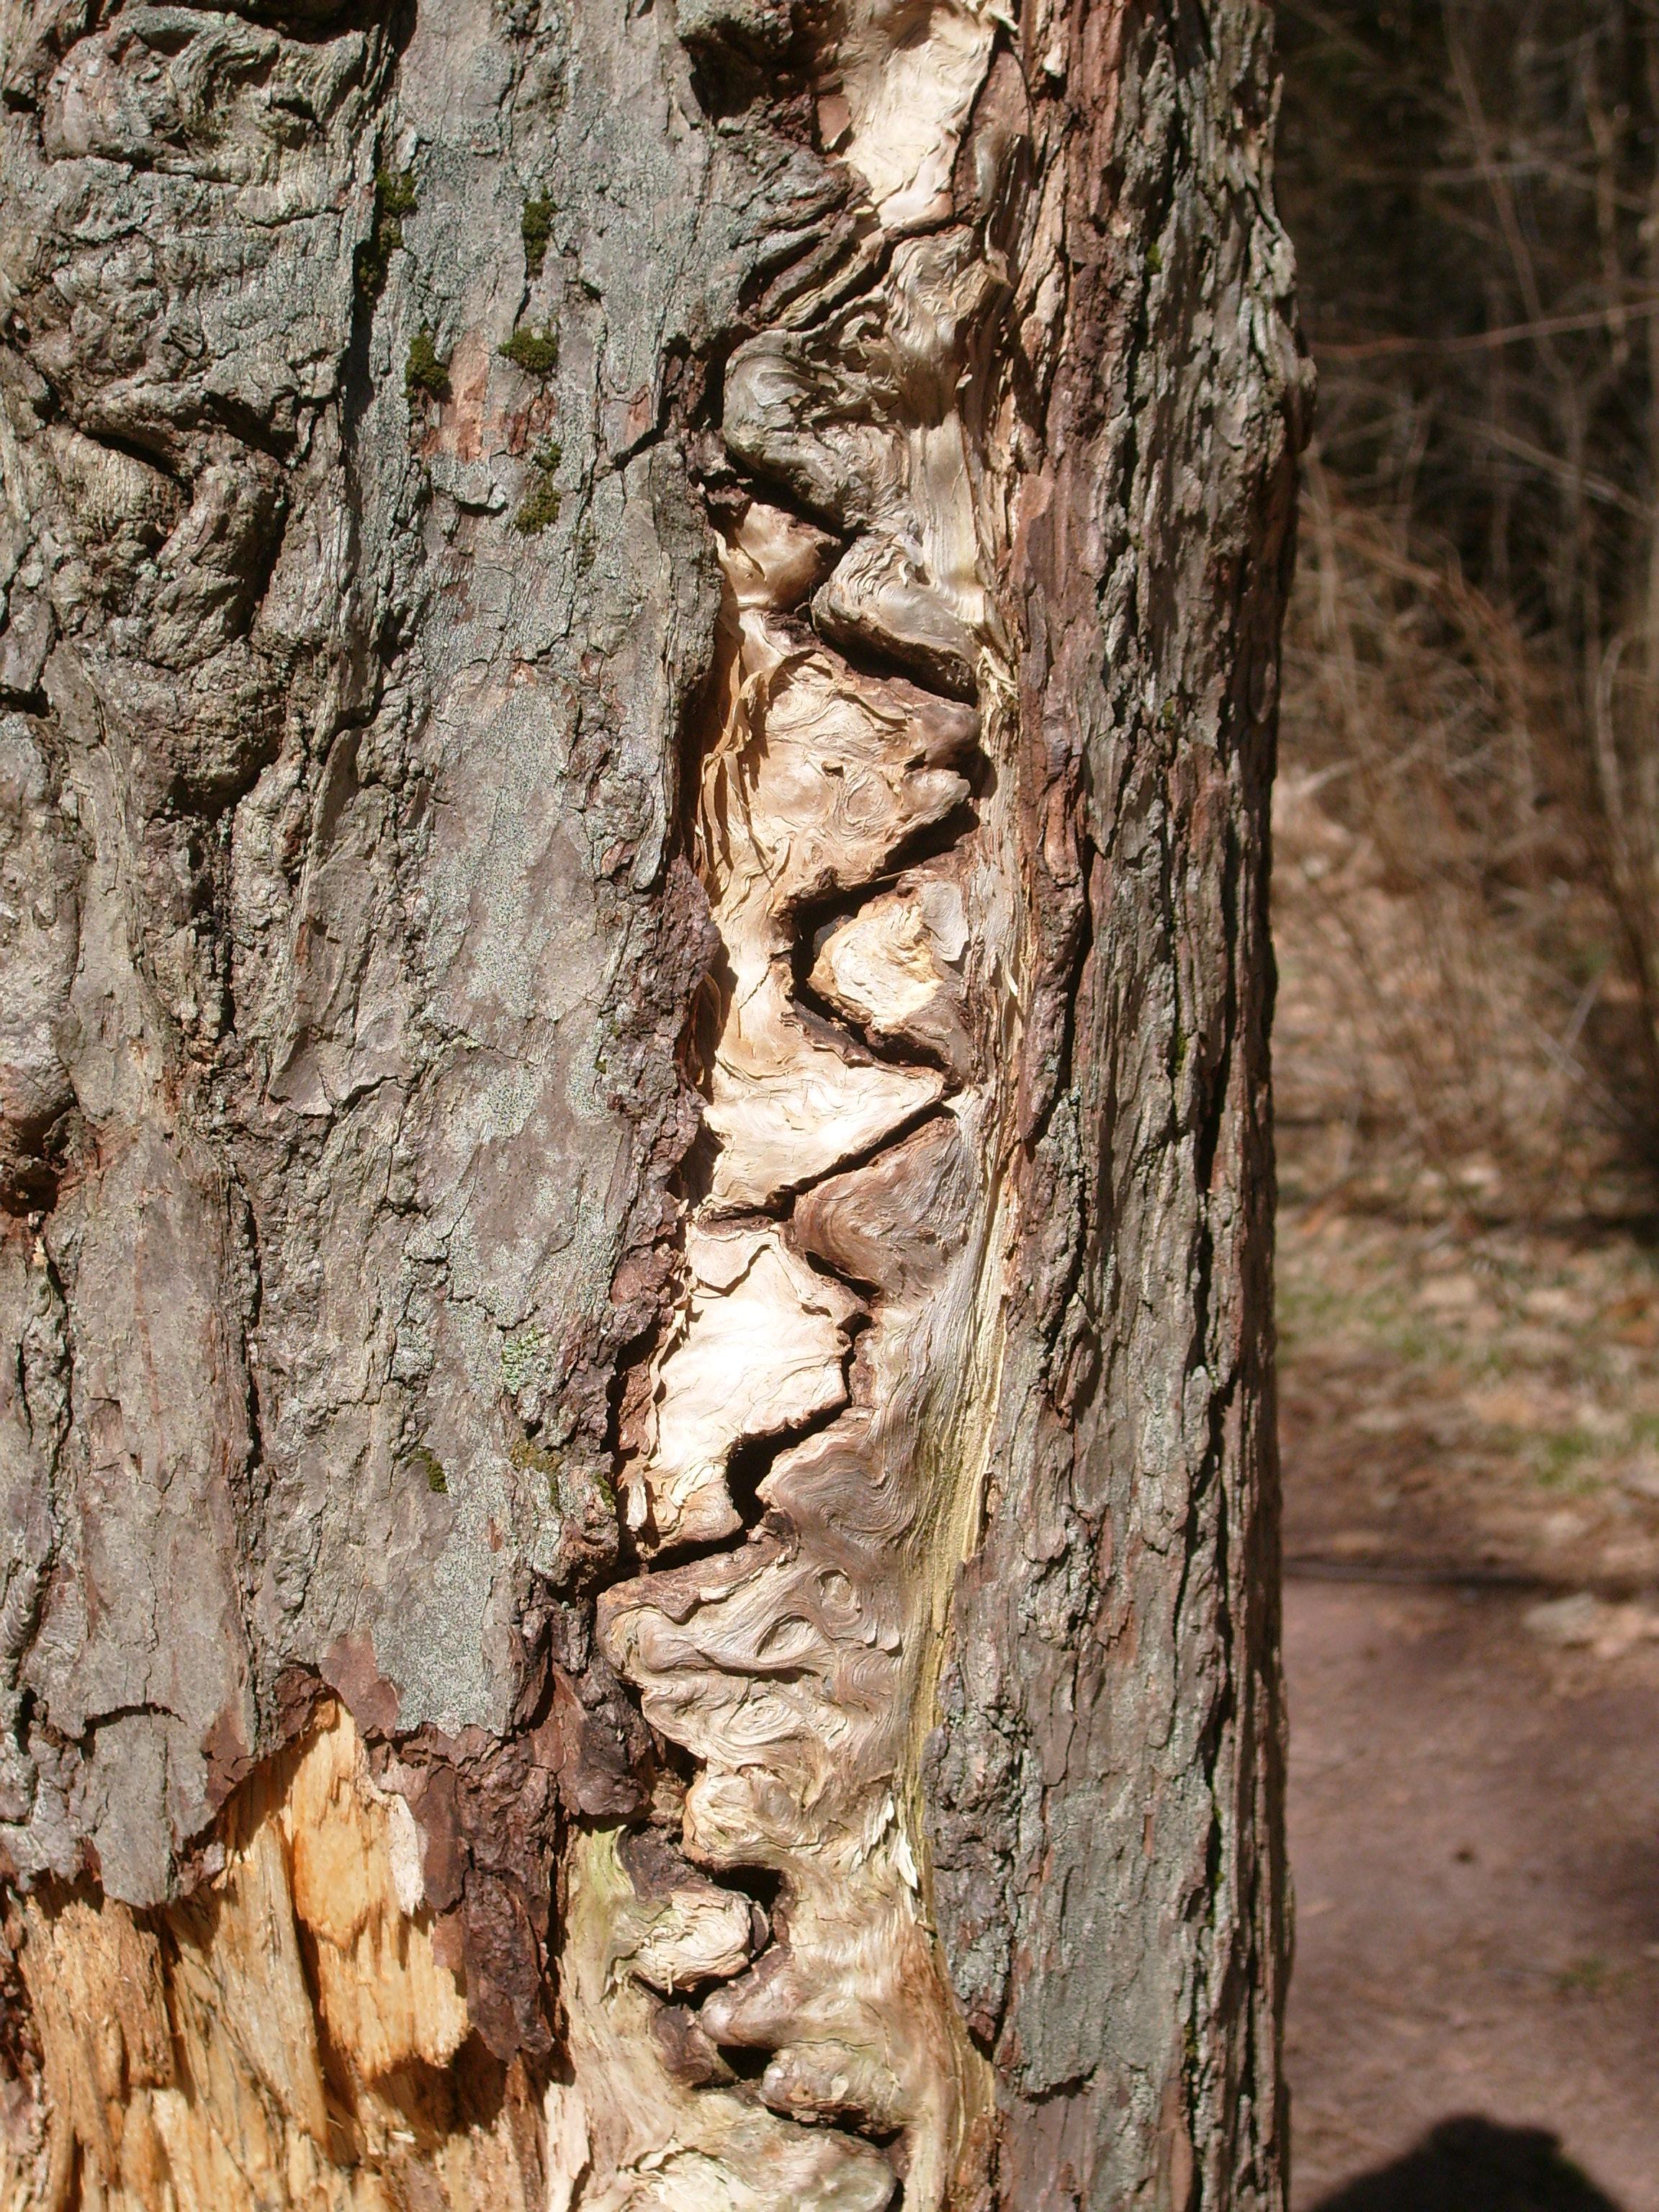 Walking Tree Ents #2